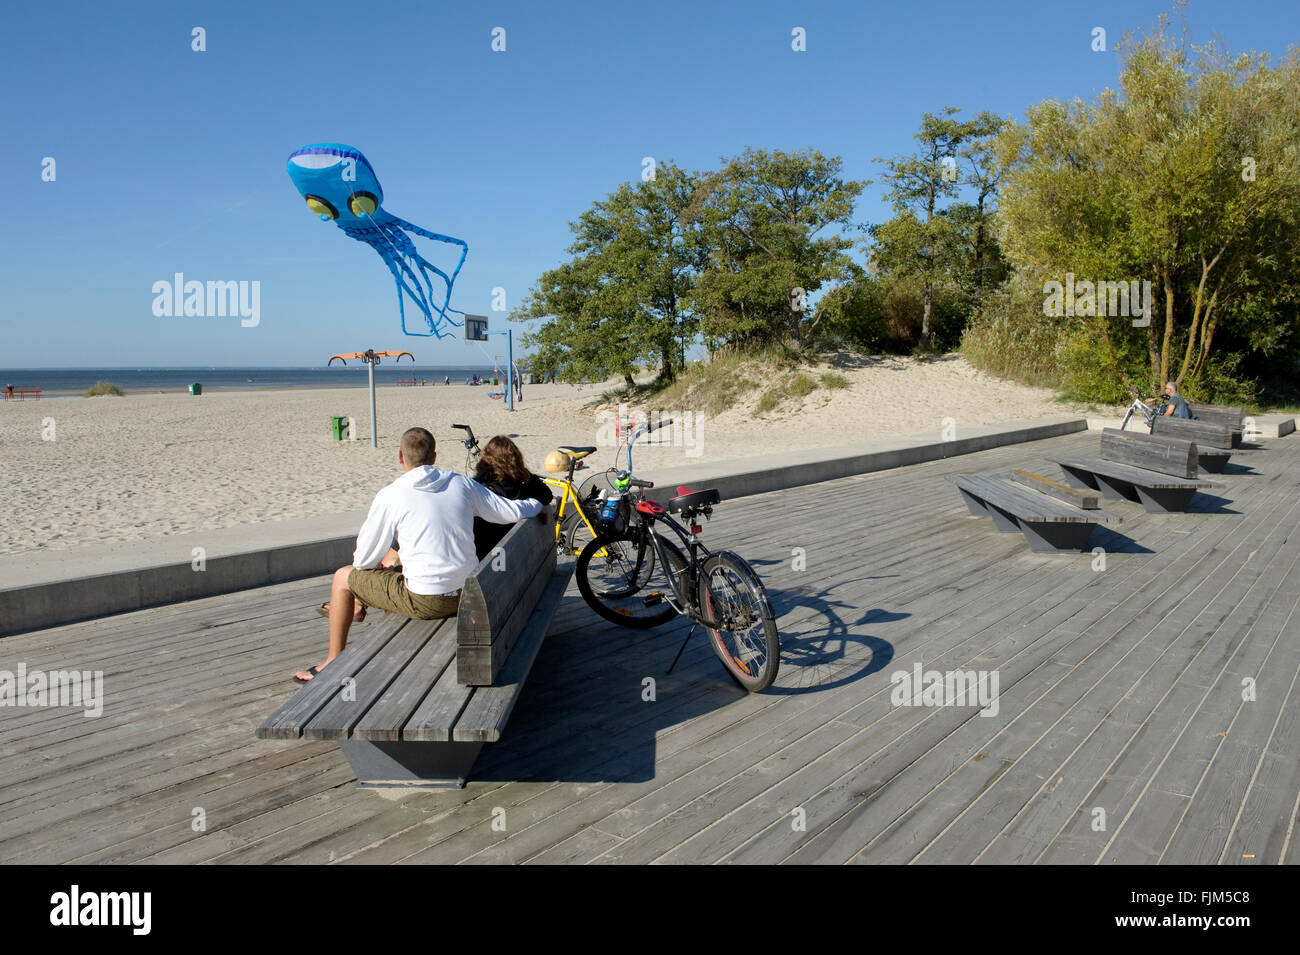 Géographie / billet, l'Estonie, Tallinn, plages, couple watching kite en forme d'un Additional-Rights Clearance-Info-poulpe,-Not-Available Banque D'Images